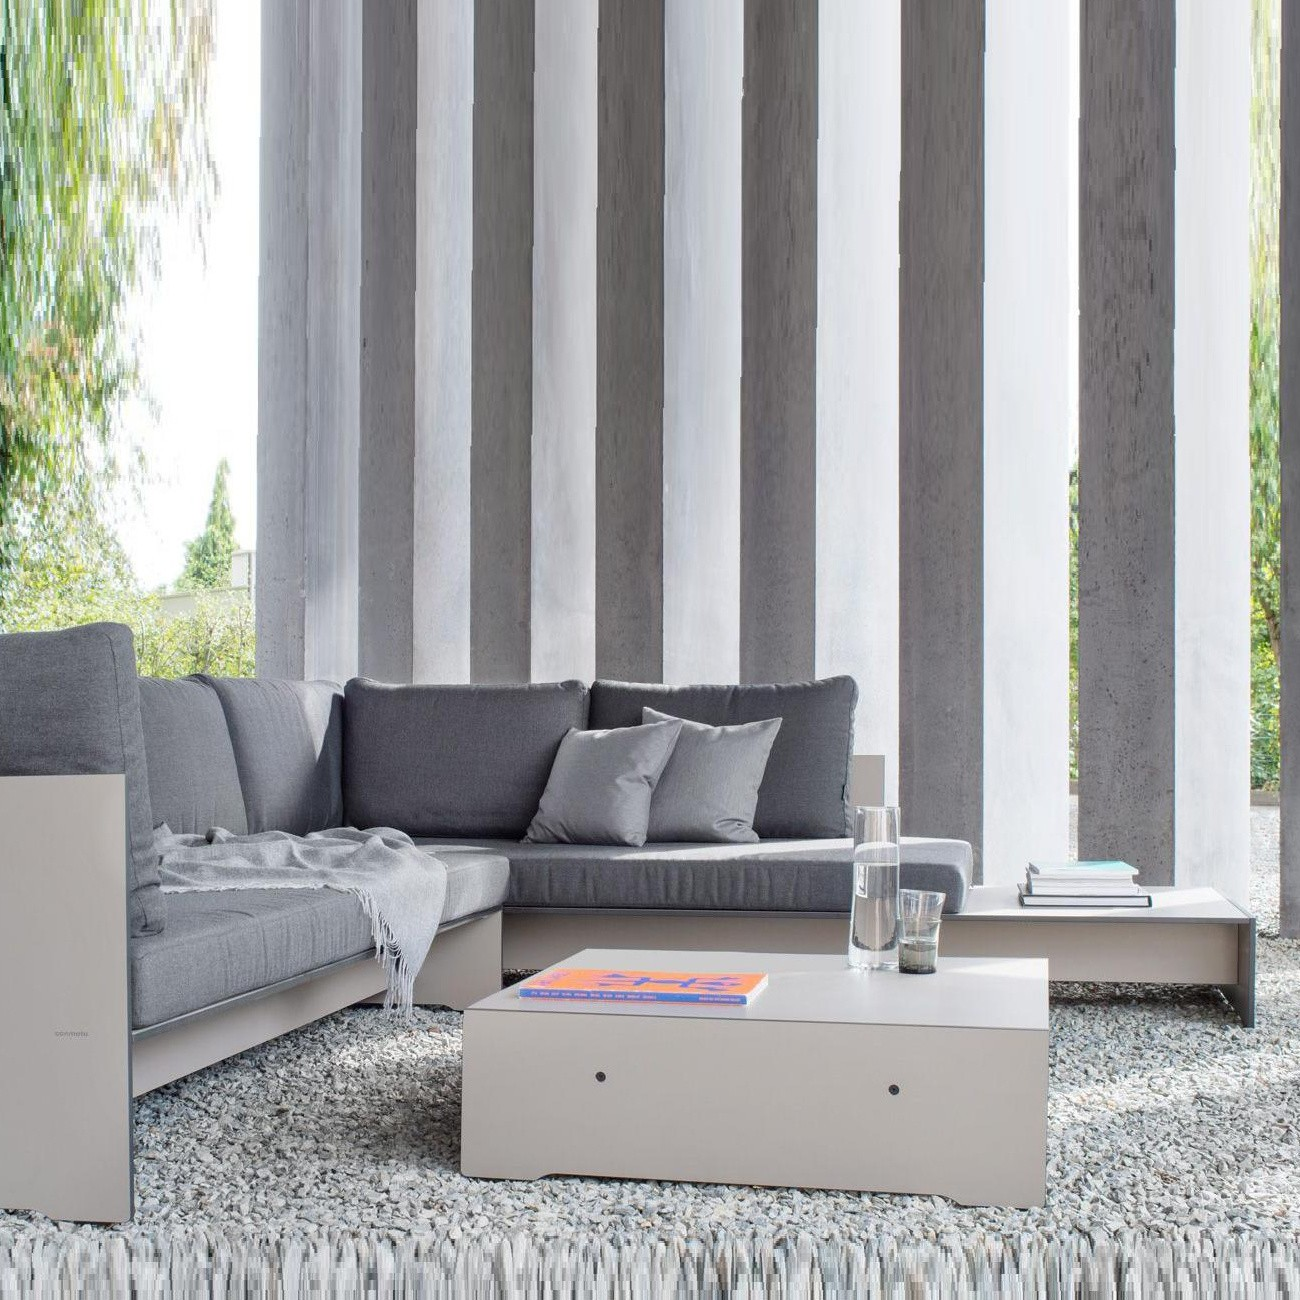 Conmoto Riva Lounge Couchtisch 1300x1300 ID 4622cff ec5bc3b05f9b46ca8b